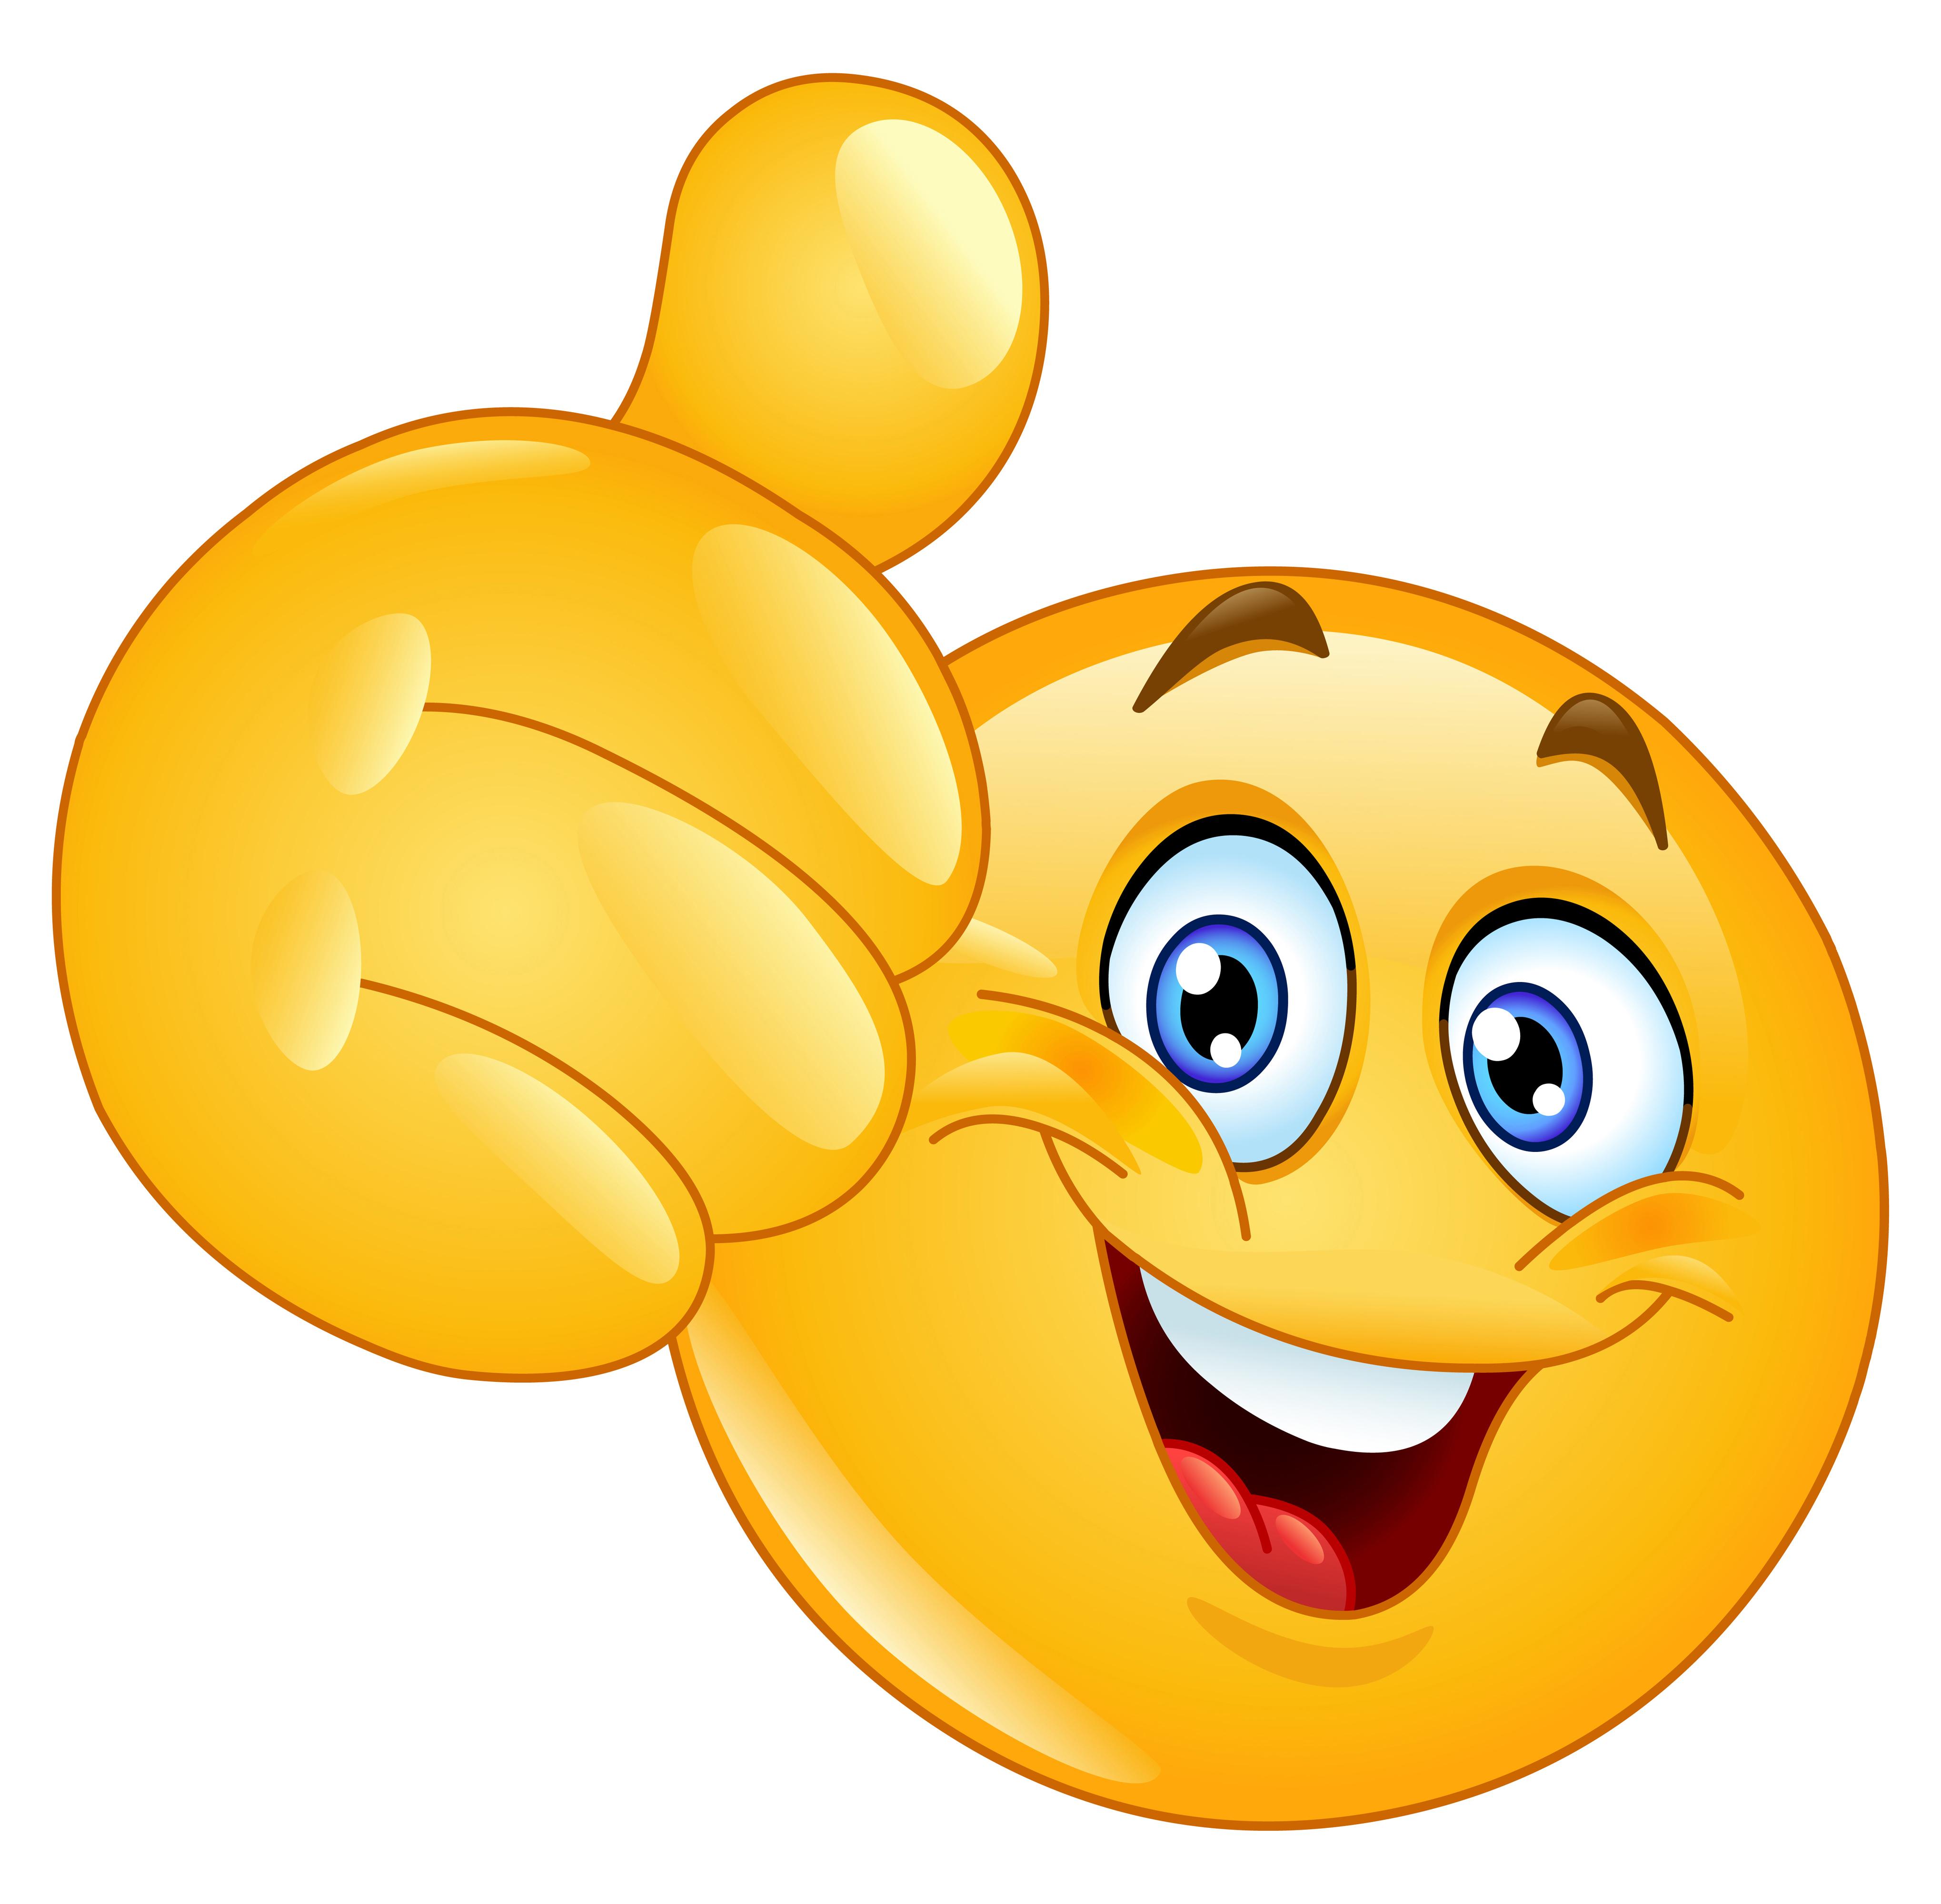 4077x4000 Thumb Up Emoticon Kitty Bucholtz, Author